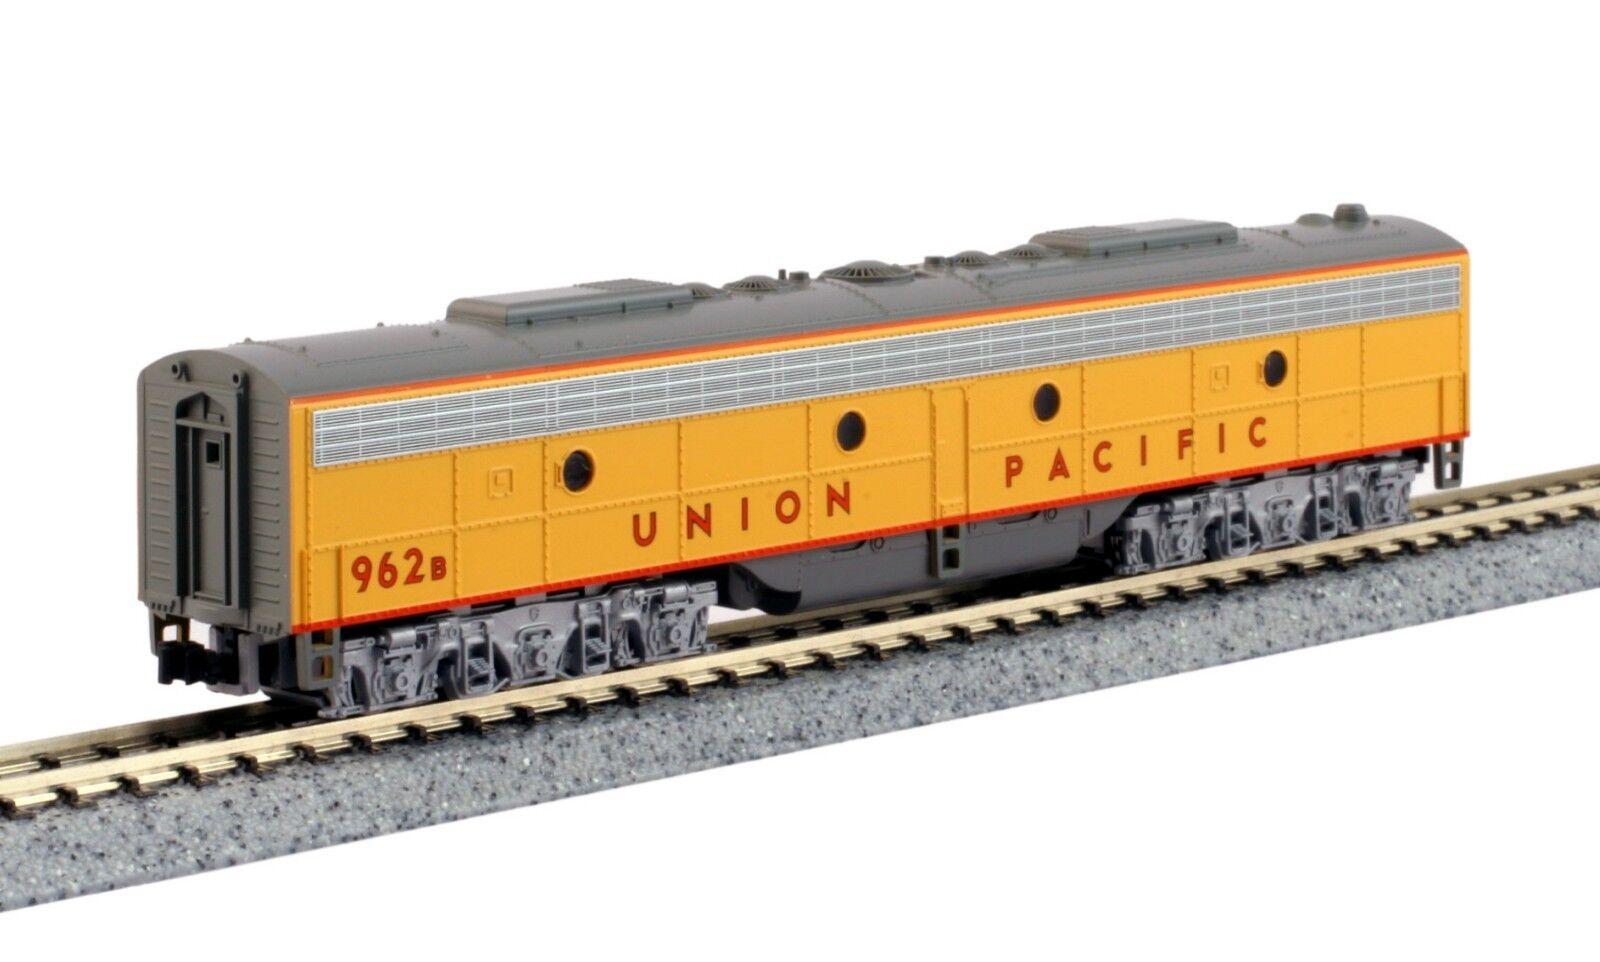 Escala N-Kato 176-5355-DCC Union Pacific EMD E9B Locomotora 962B DCC equipado